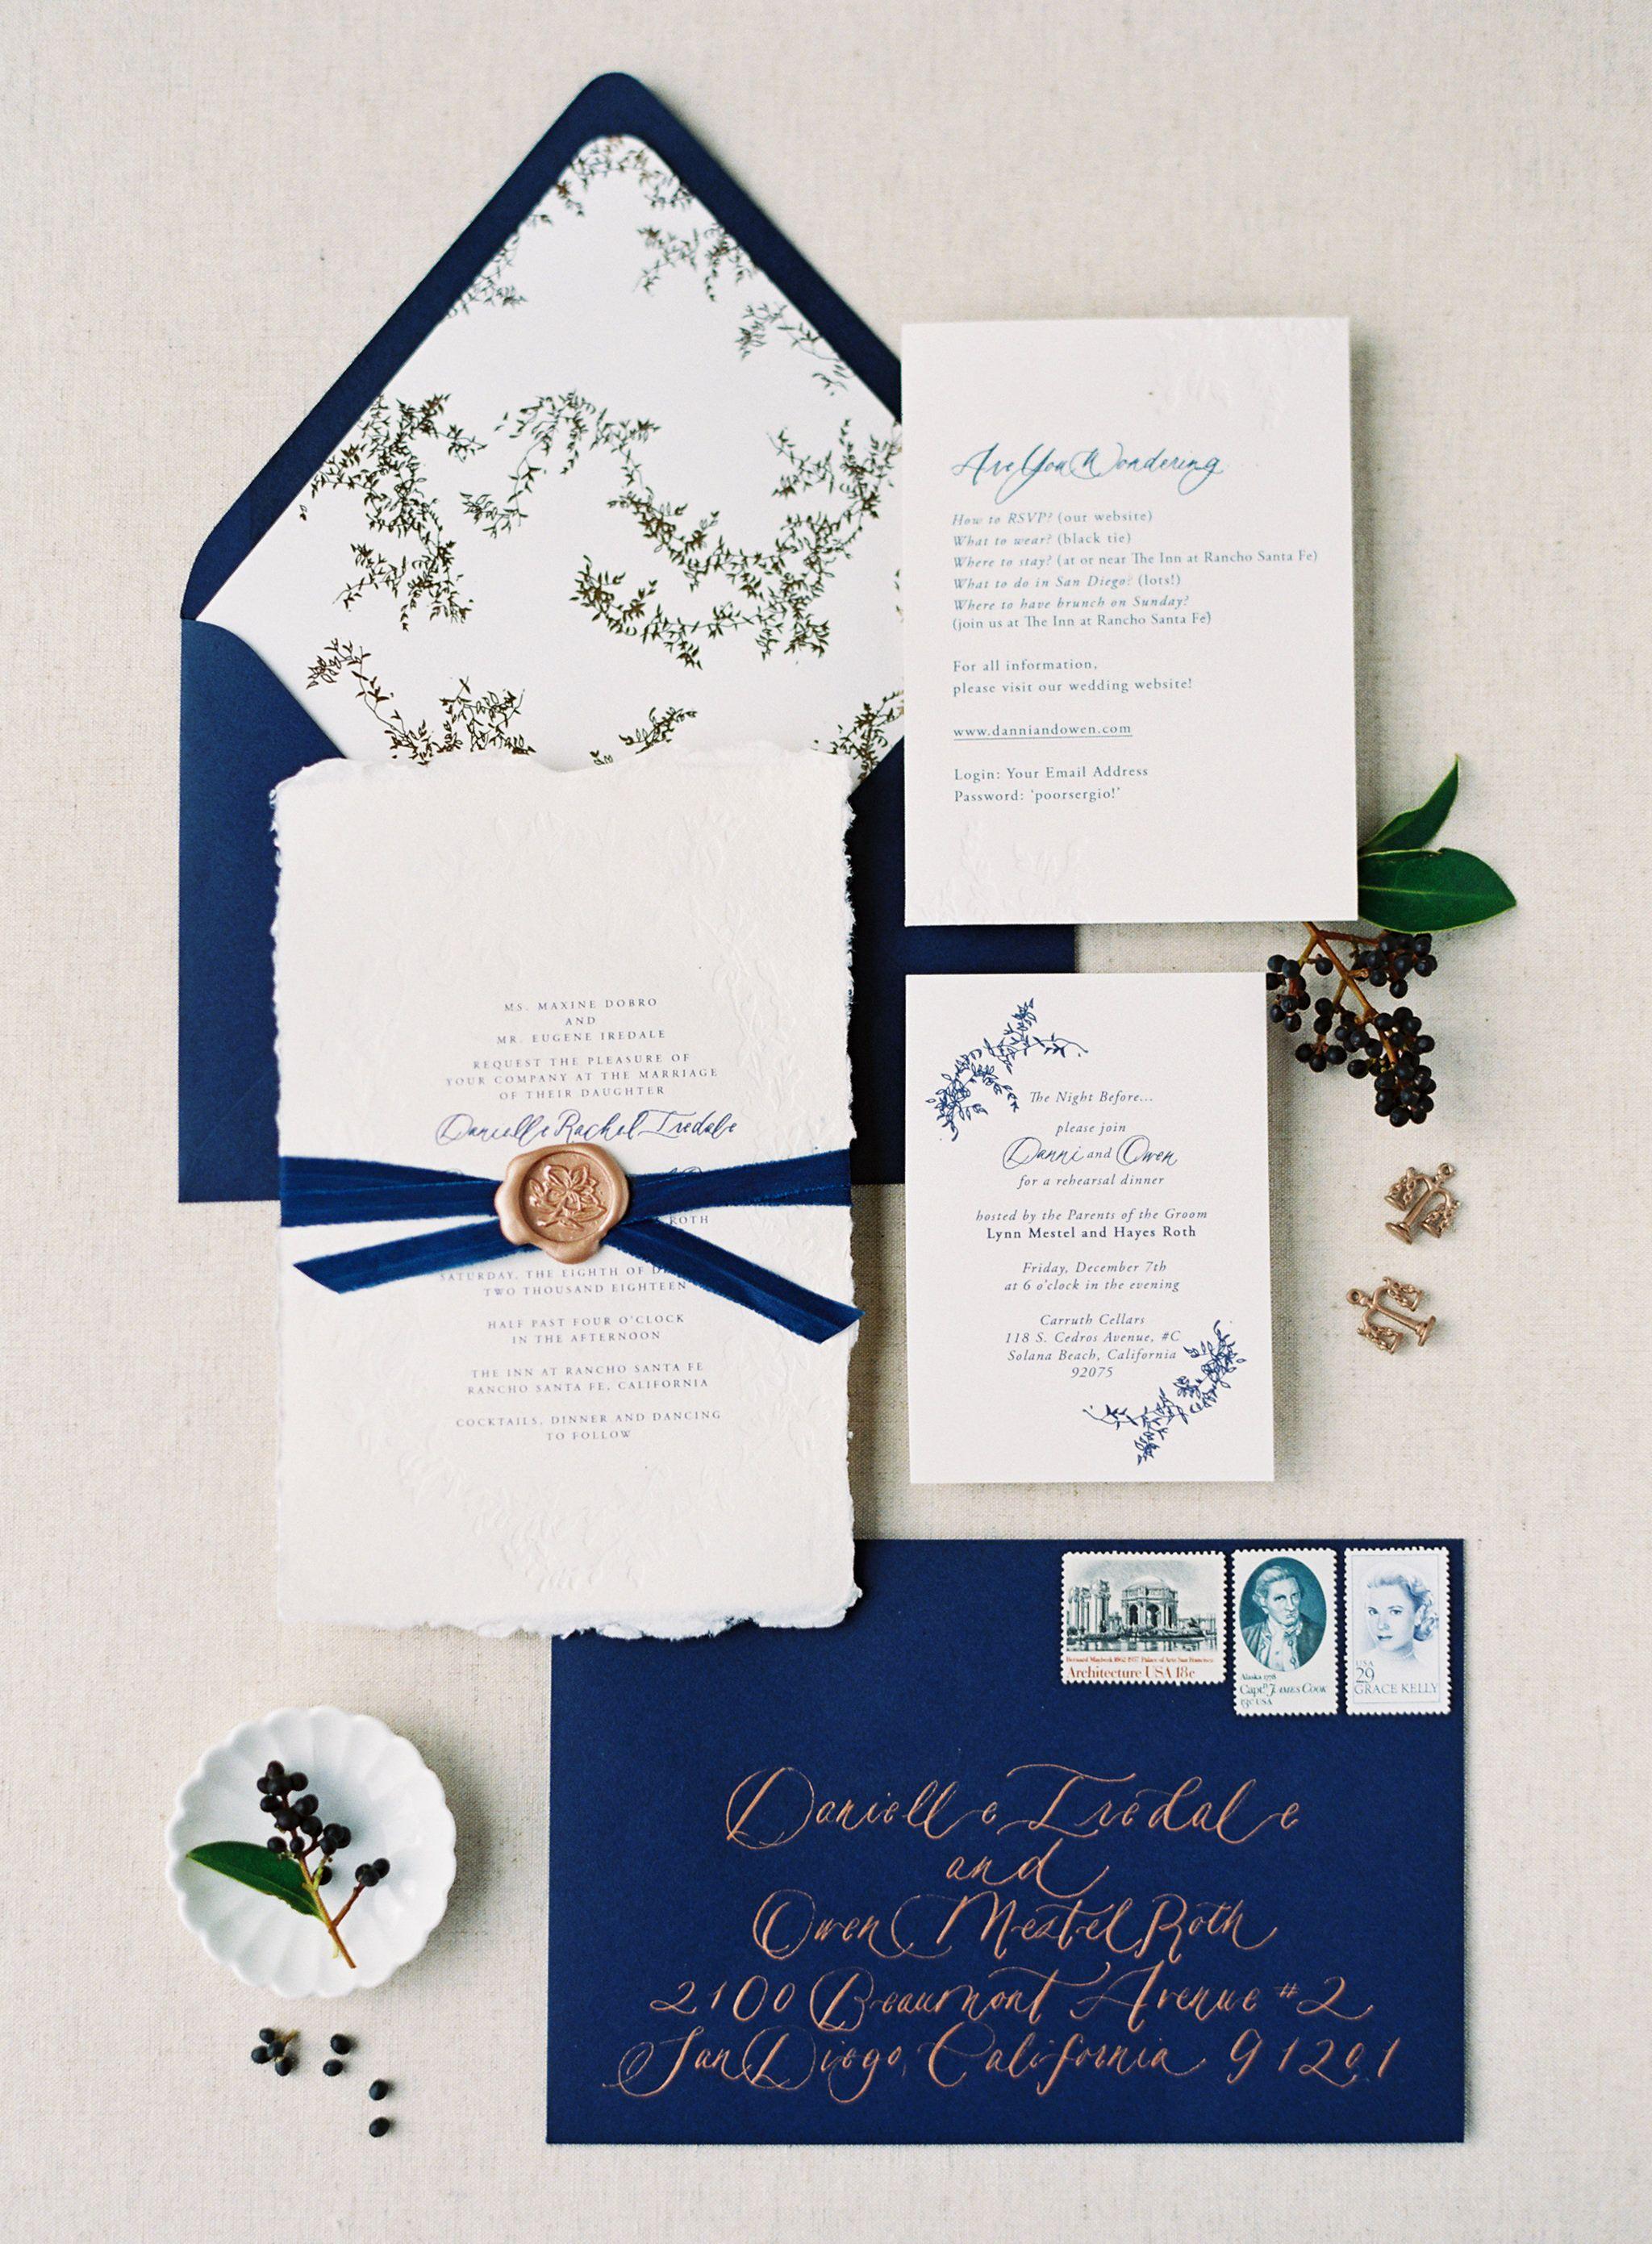 30 Beach Wedding Invitations Ideas With Images Beach Theme